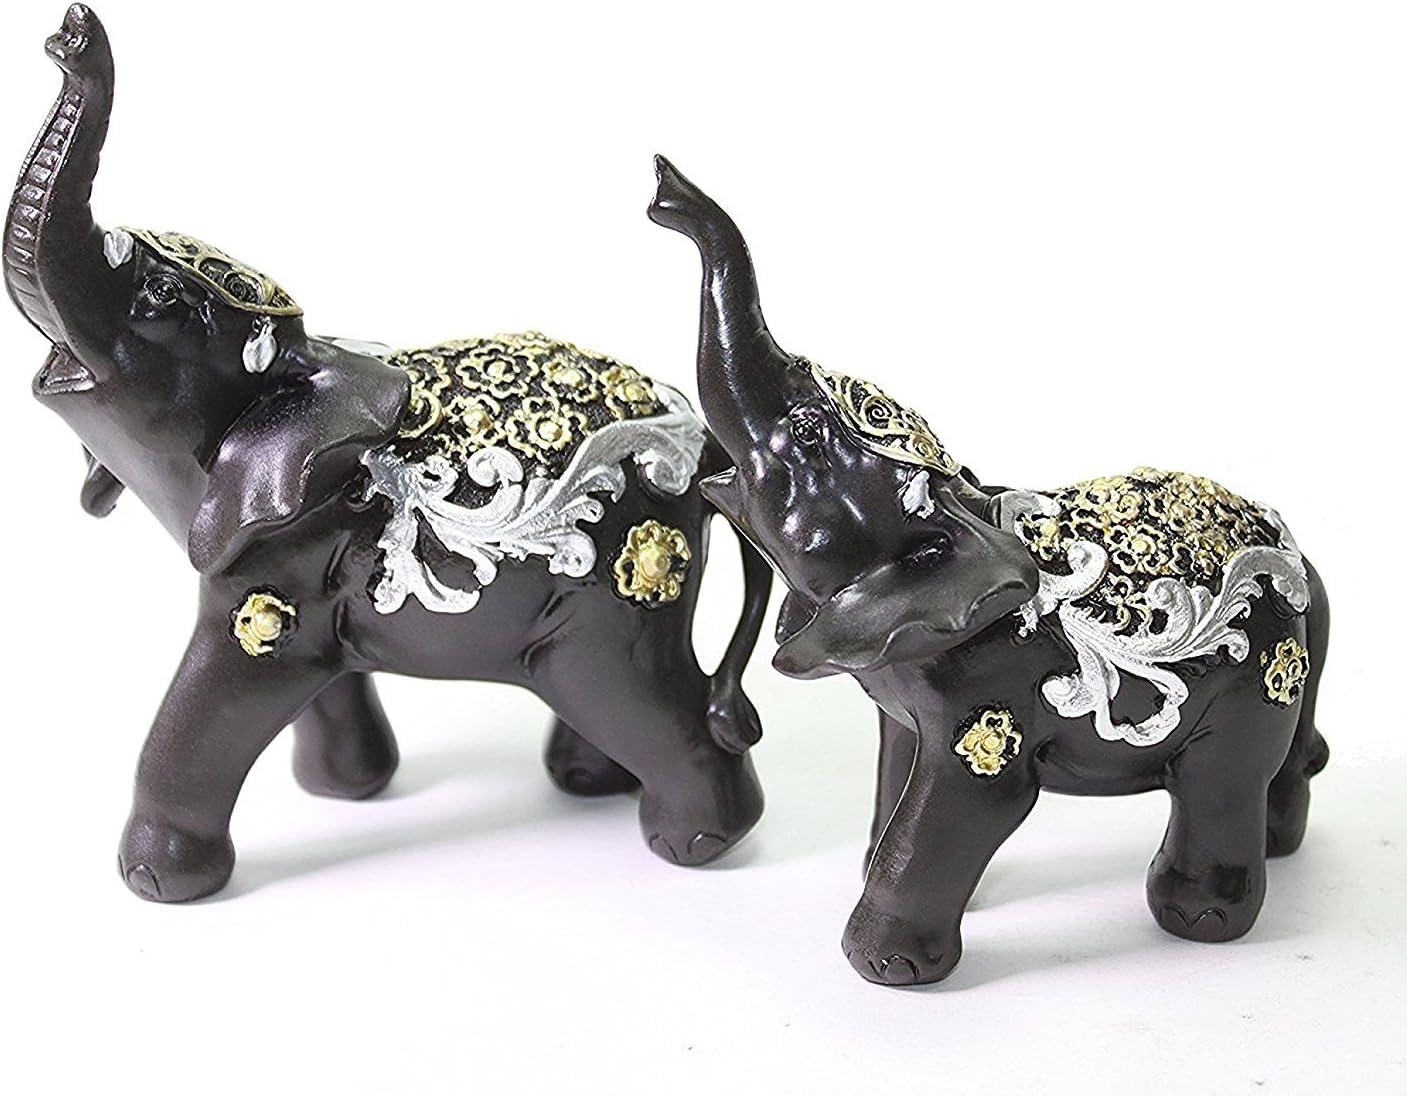 Set of 2 Feng Shui Black Elephants Trunk Statue Lucky Figurine Gift Home Decor